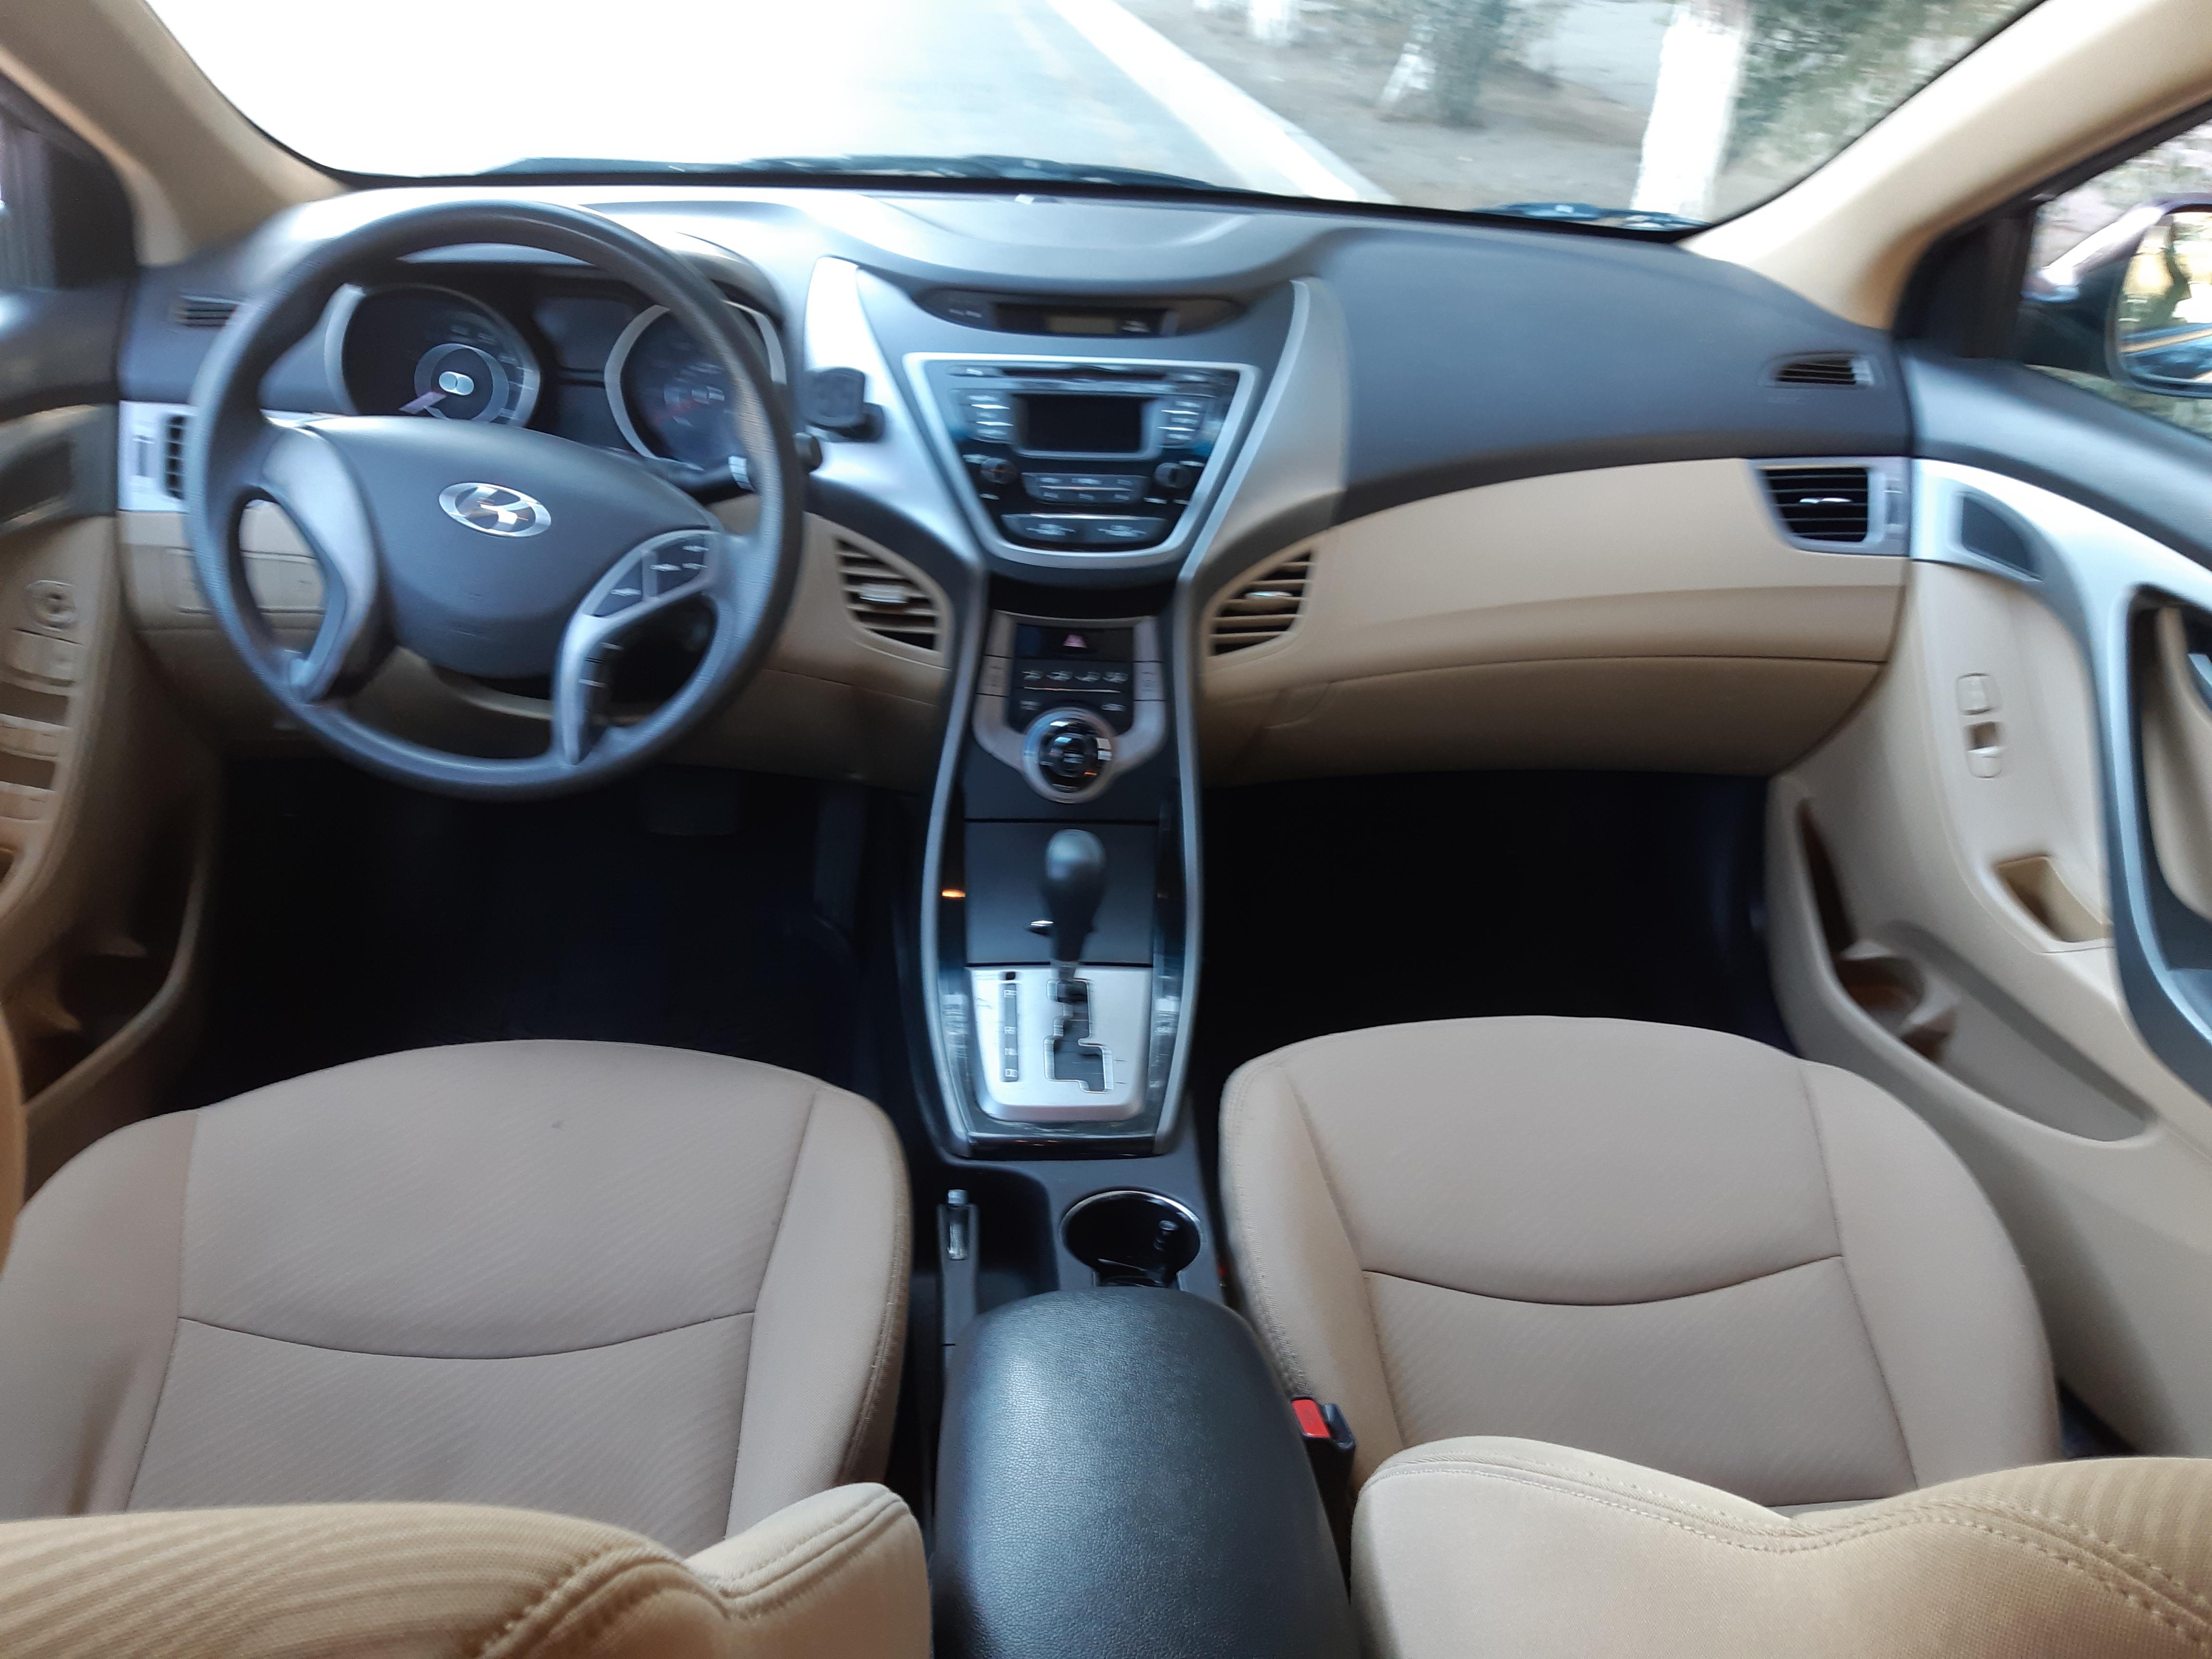 Hyundai Elantra 1.8(lt) 2013 İkinci əl  $9000